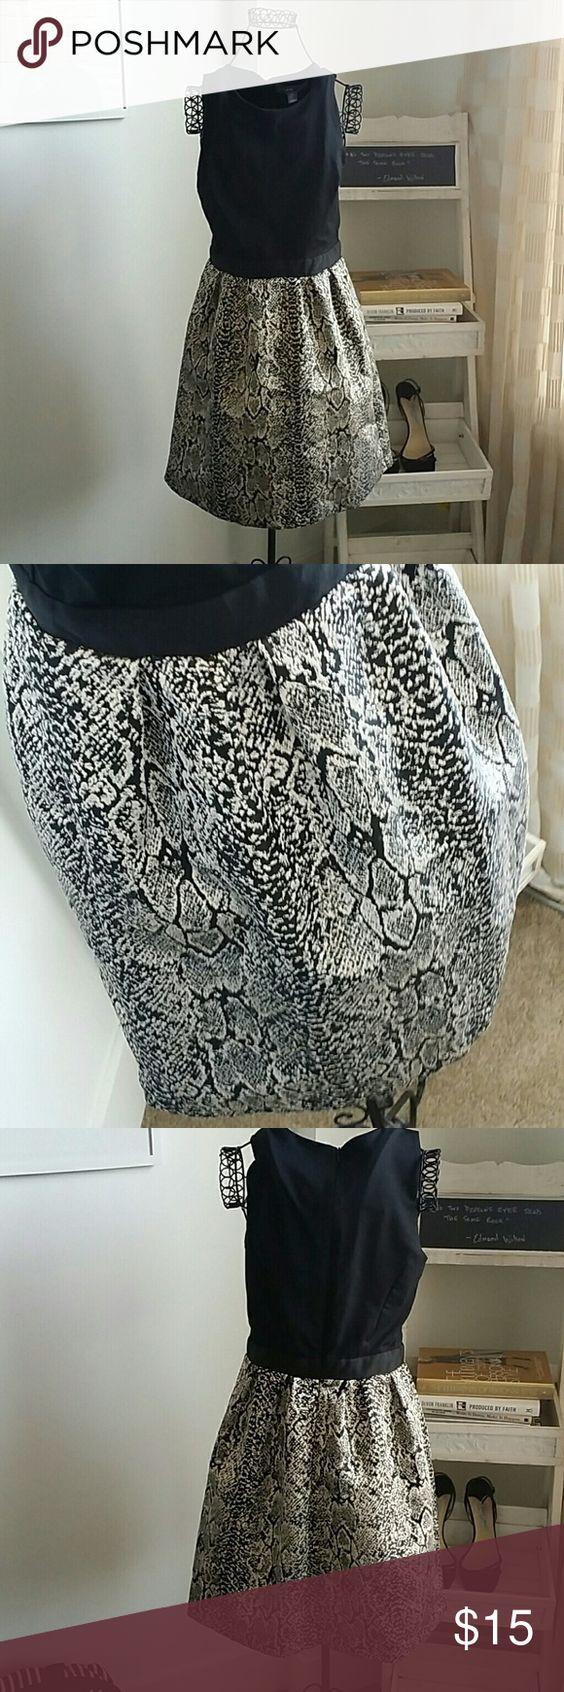 Donna Ricco Black Sleeveless Dress Black Sleeveless Dress with Snack Skin Printed Bottom. Great condition, non smoking home, stretch bodice. Size 5. Donna Ricco Dresses Midi